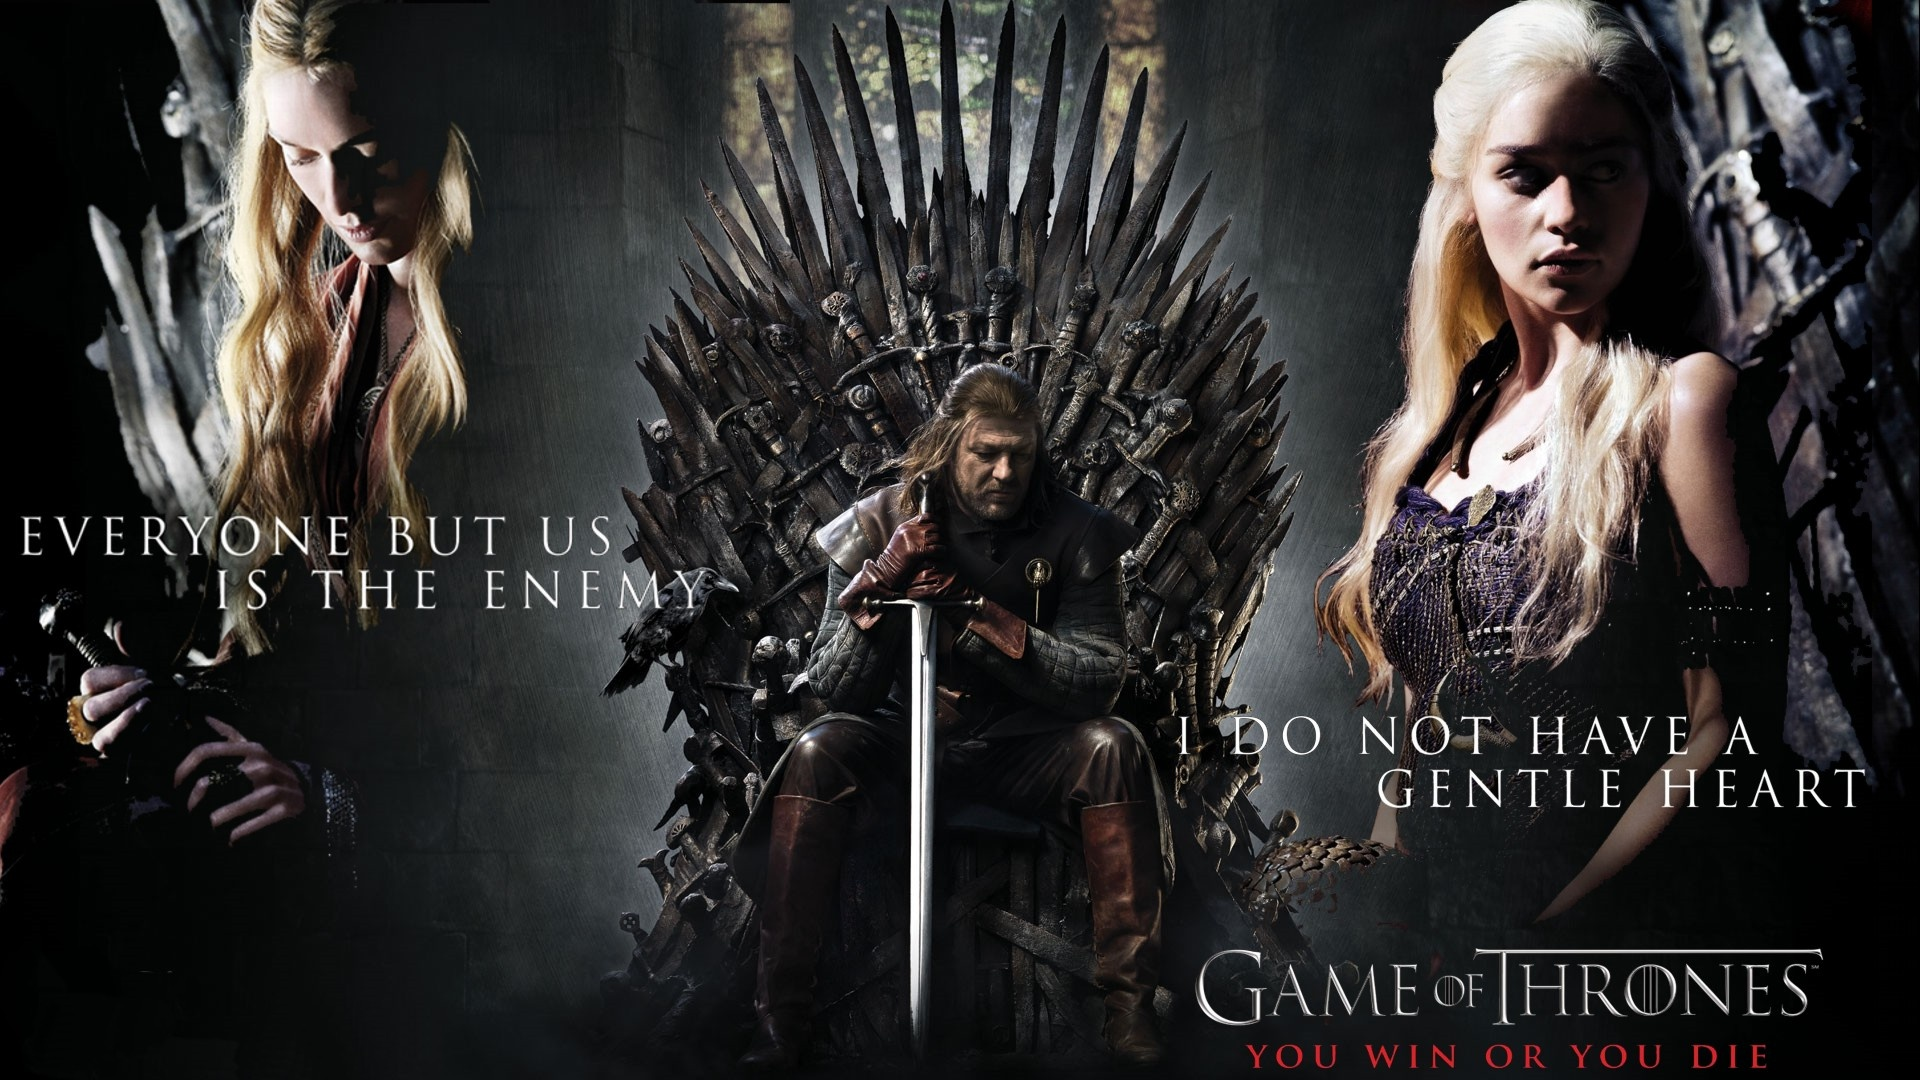 Game Of Thrones Hd 1920x1080 Full Hd 2k Hintergrundbilder